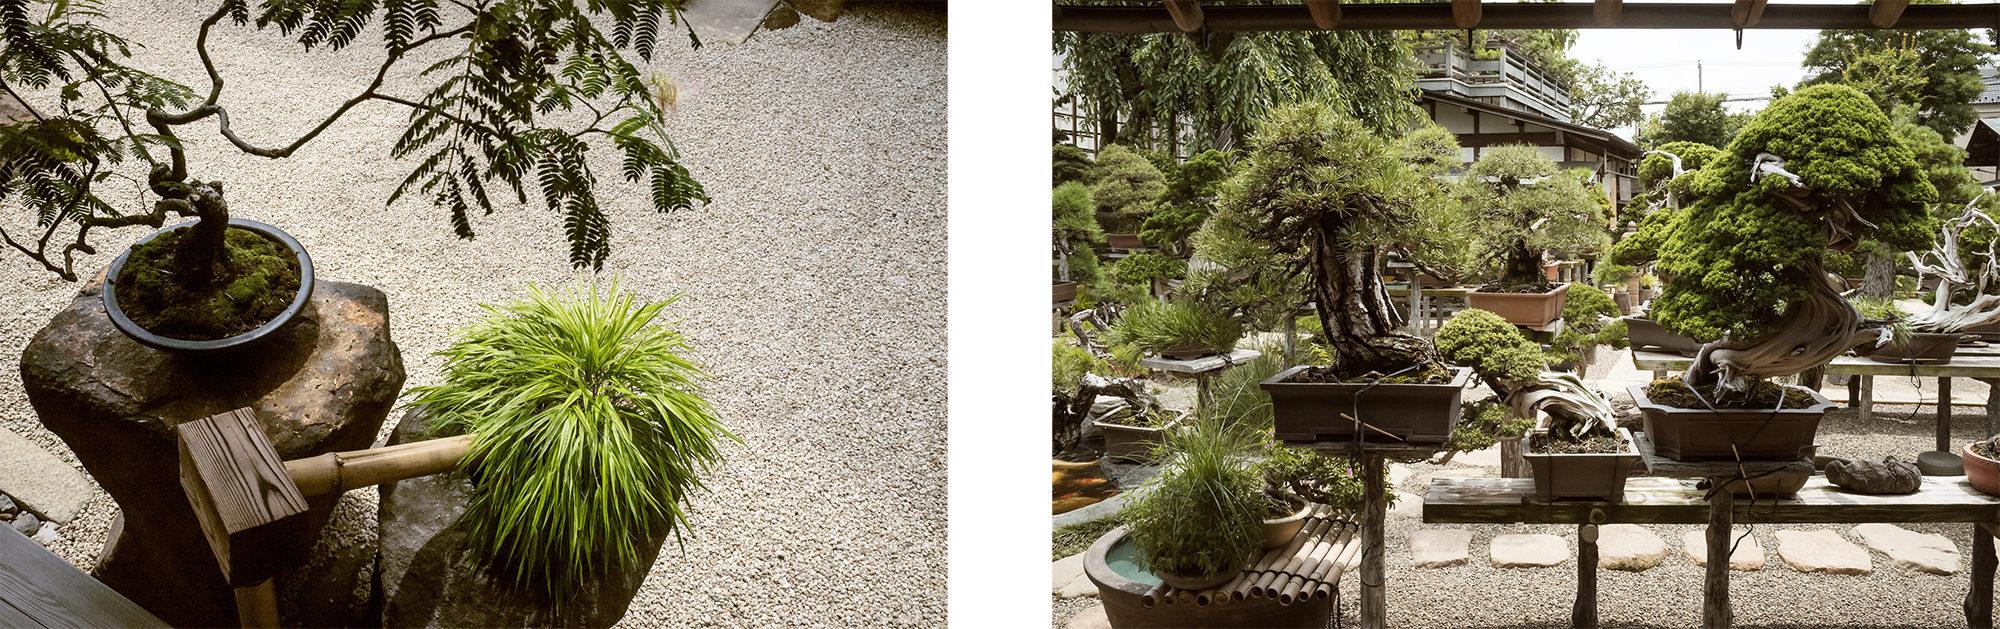 shunkaen bonsai museum tokyo